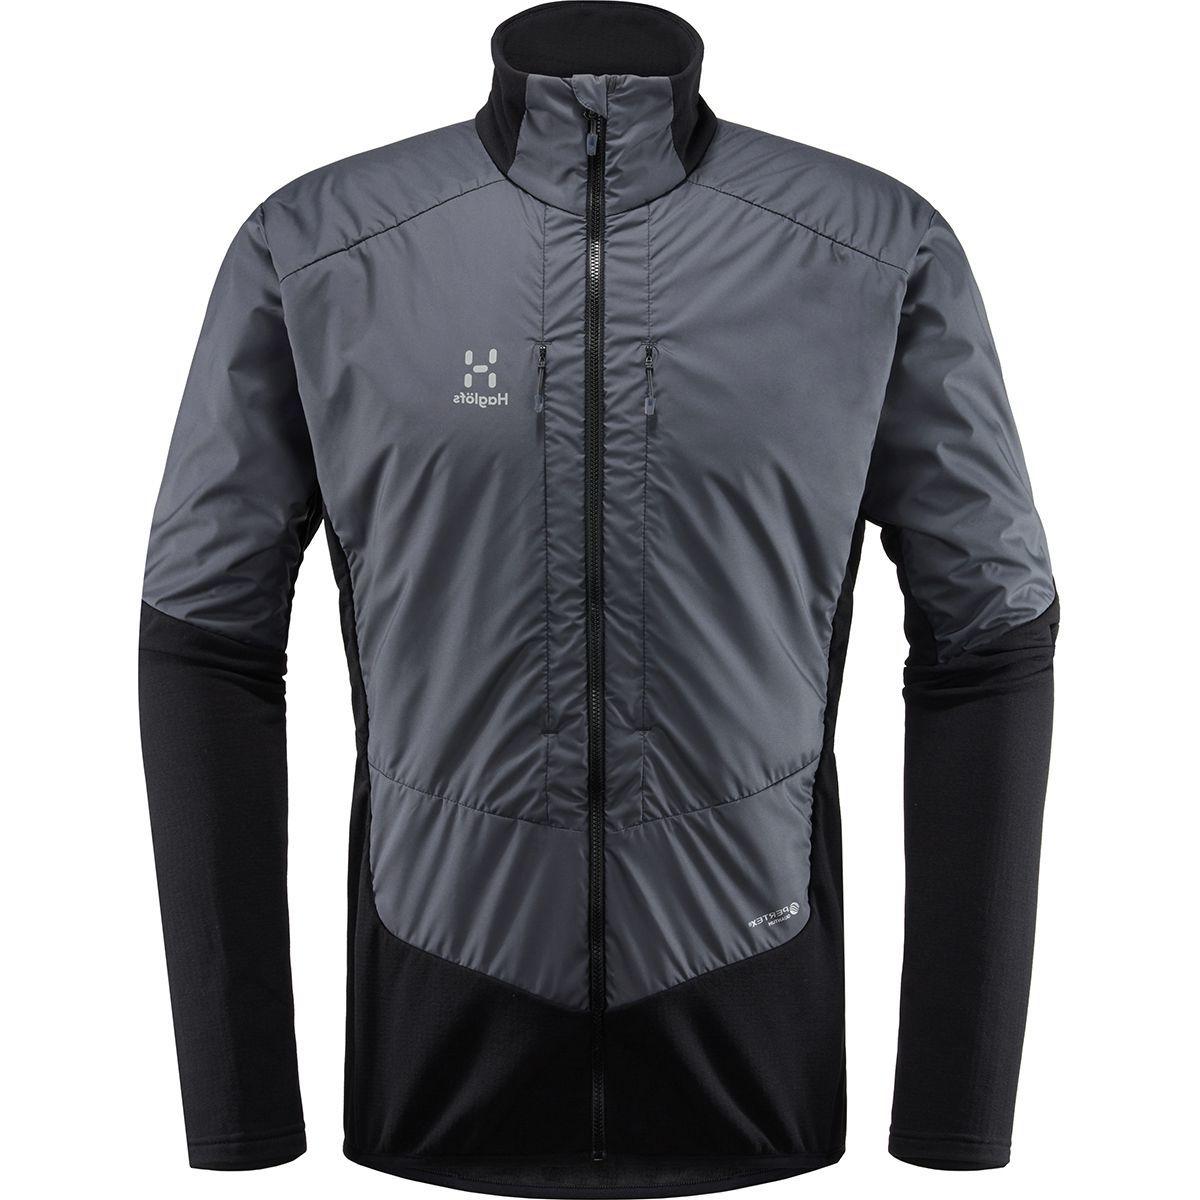 Haglofs Touring Hybrid Jacket - Men's